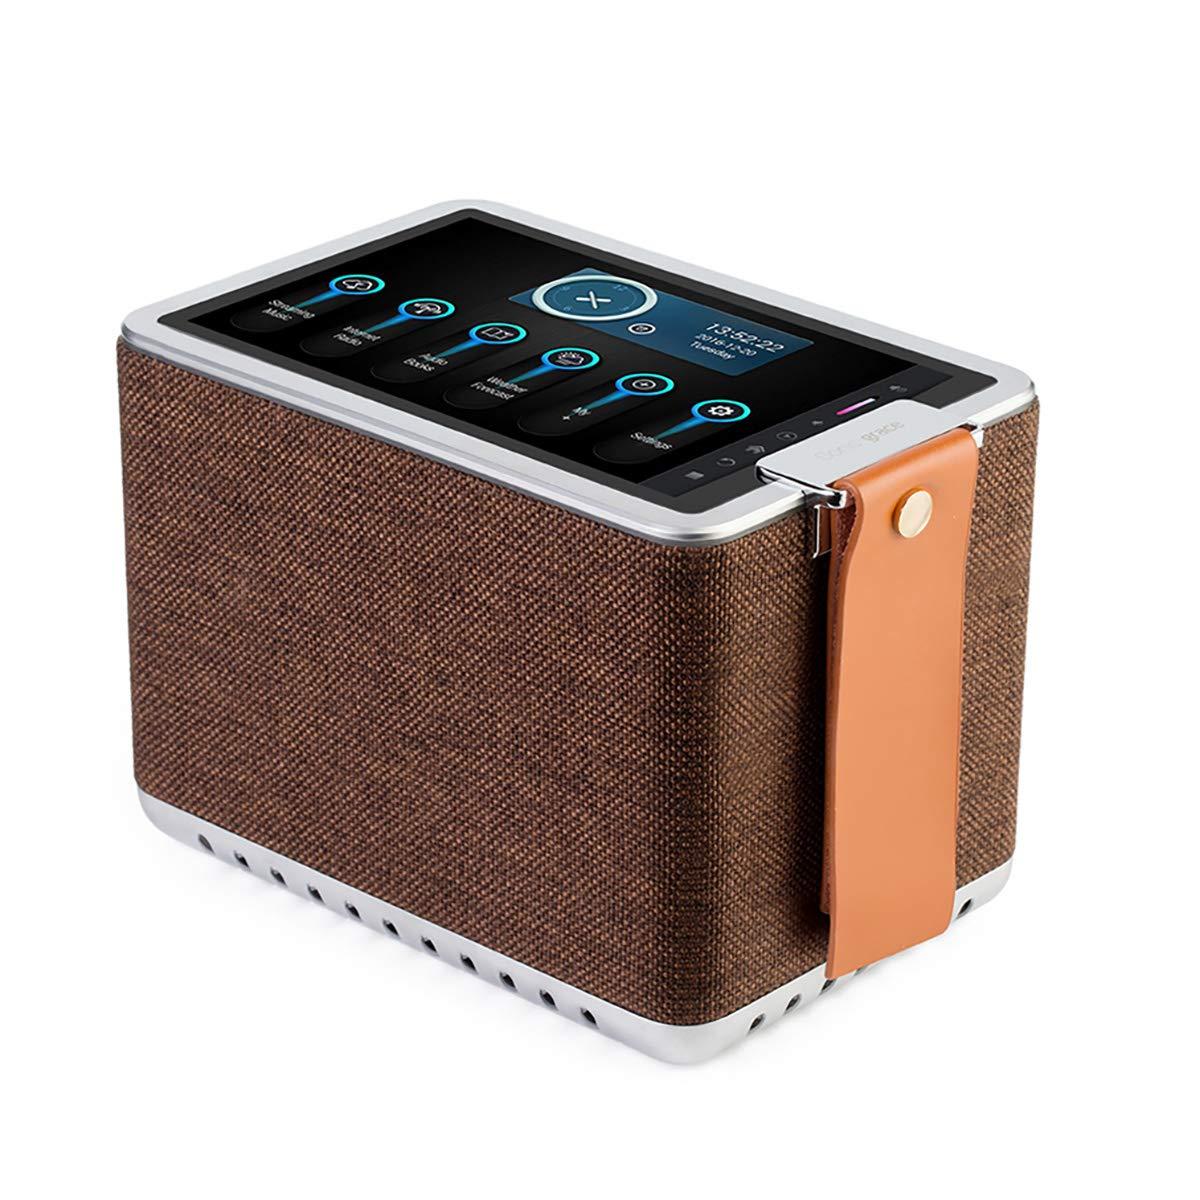 Sonicgrace Wi-Fi Internet Radio, 8'' High Definition Touchscreen, 40W Wireless Hi-Fi Stereo Speaker, 8-in-1 Multifunctional Bluetooth Speaker - Brown